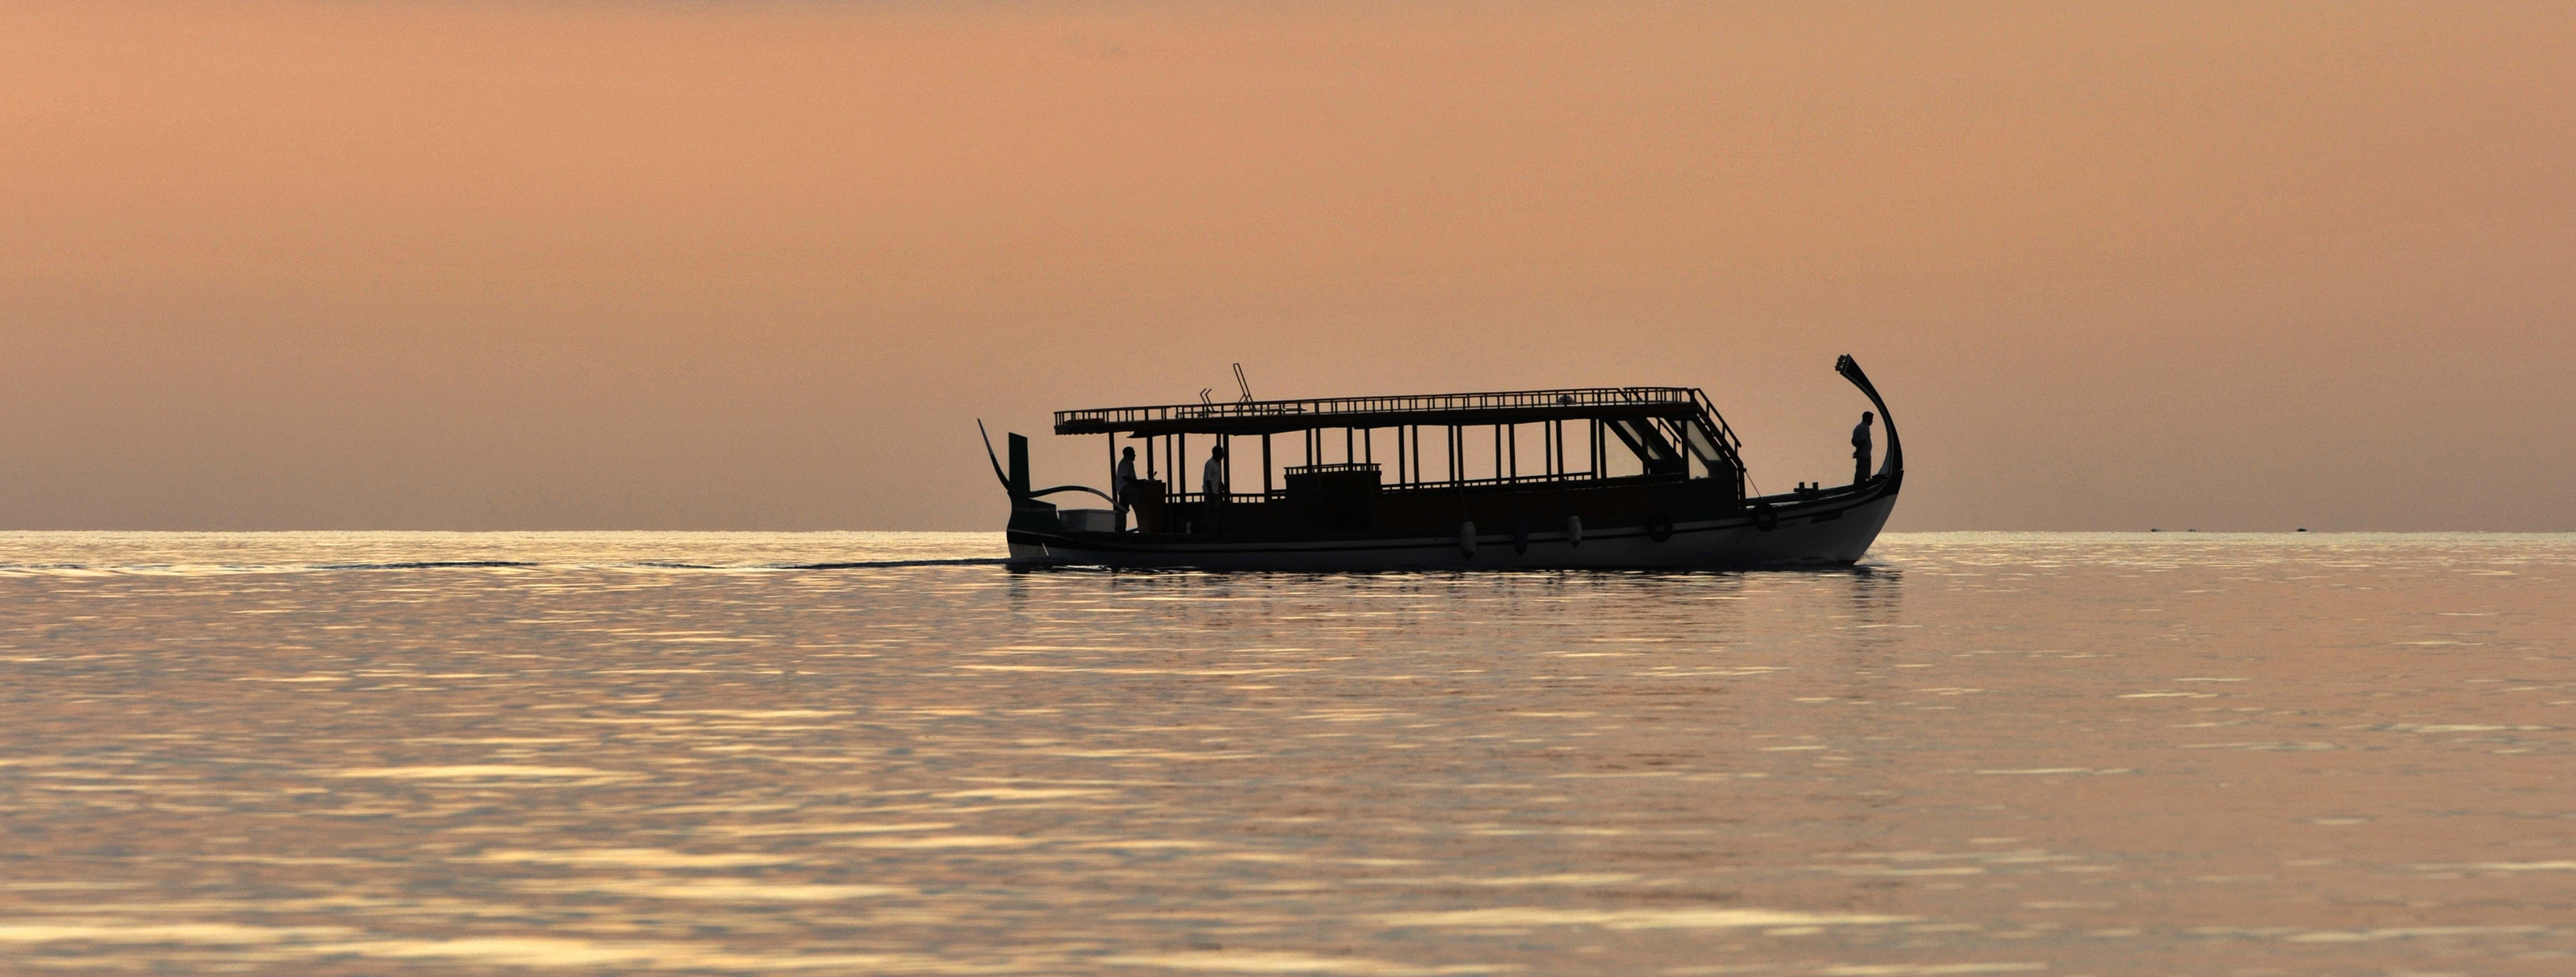 Island Hideway, MV ©Johannes Ratermann